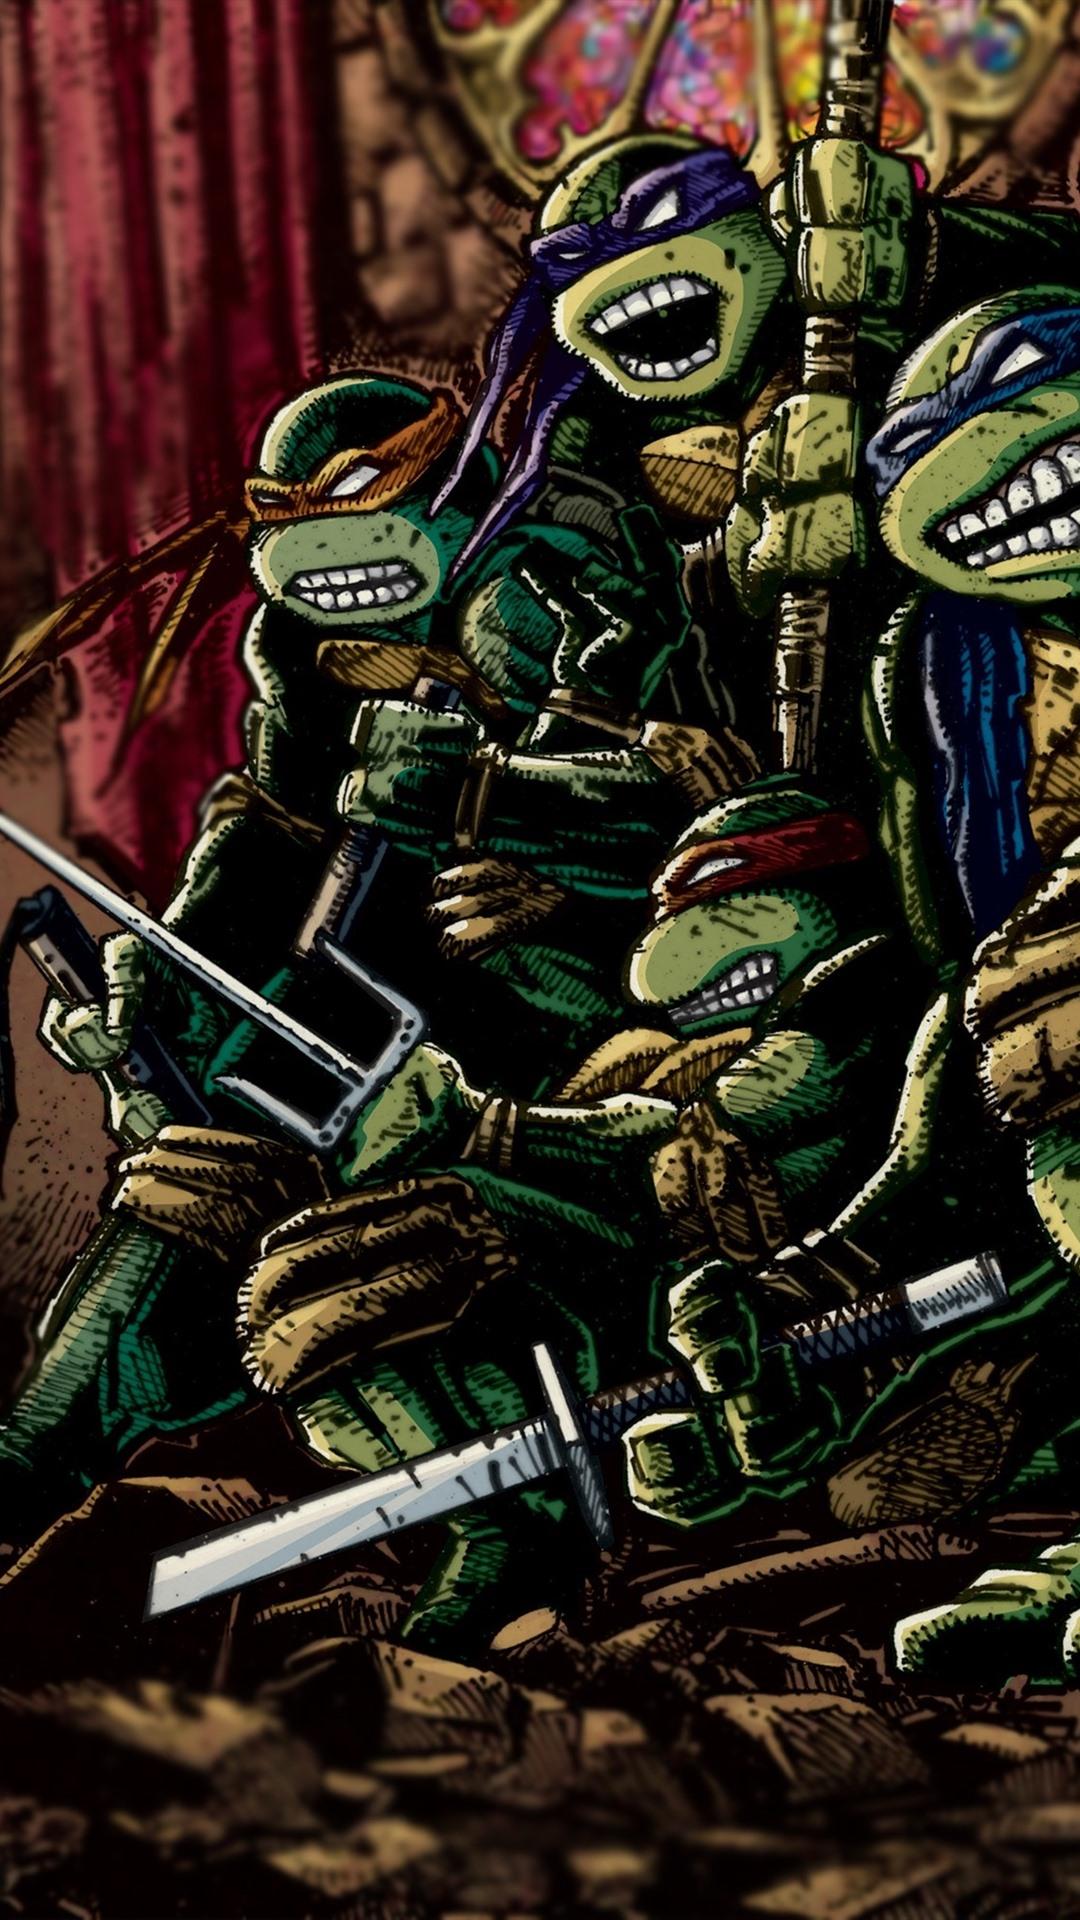 Teenage Mutant Ninja Turtles Wallpaper Iphone - HD Wallpaper